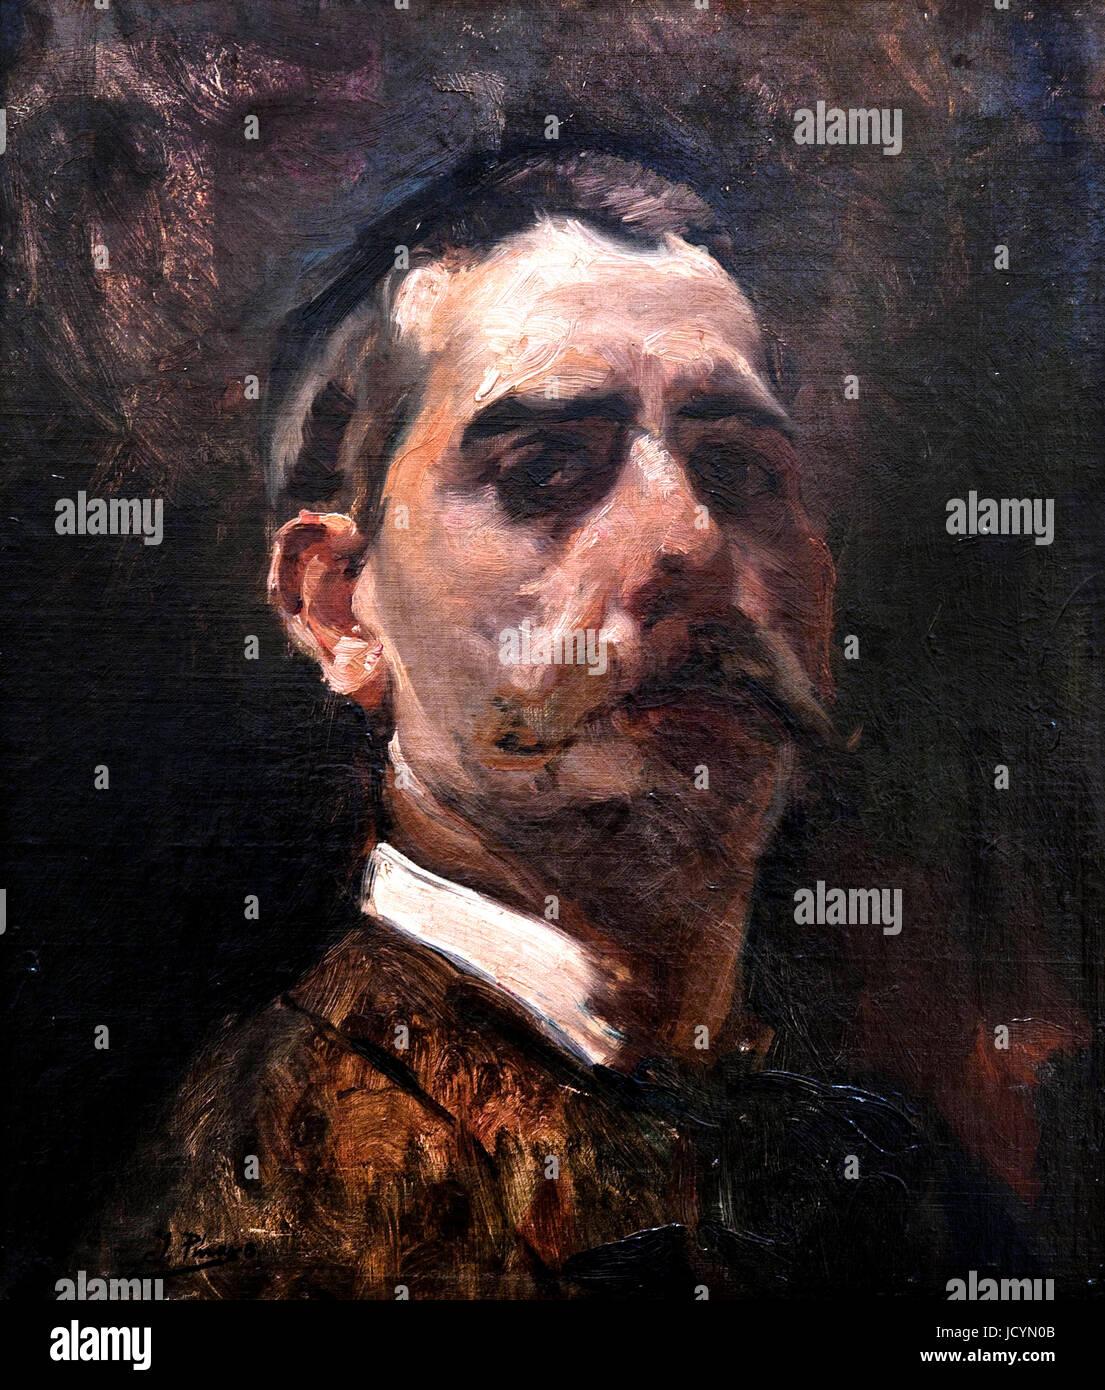 Ignacio Pinazo Camarlench, Portrait 1900 Oil on canvas. Fundacion Banco Santander, Madrid, Spain. - Stock Image